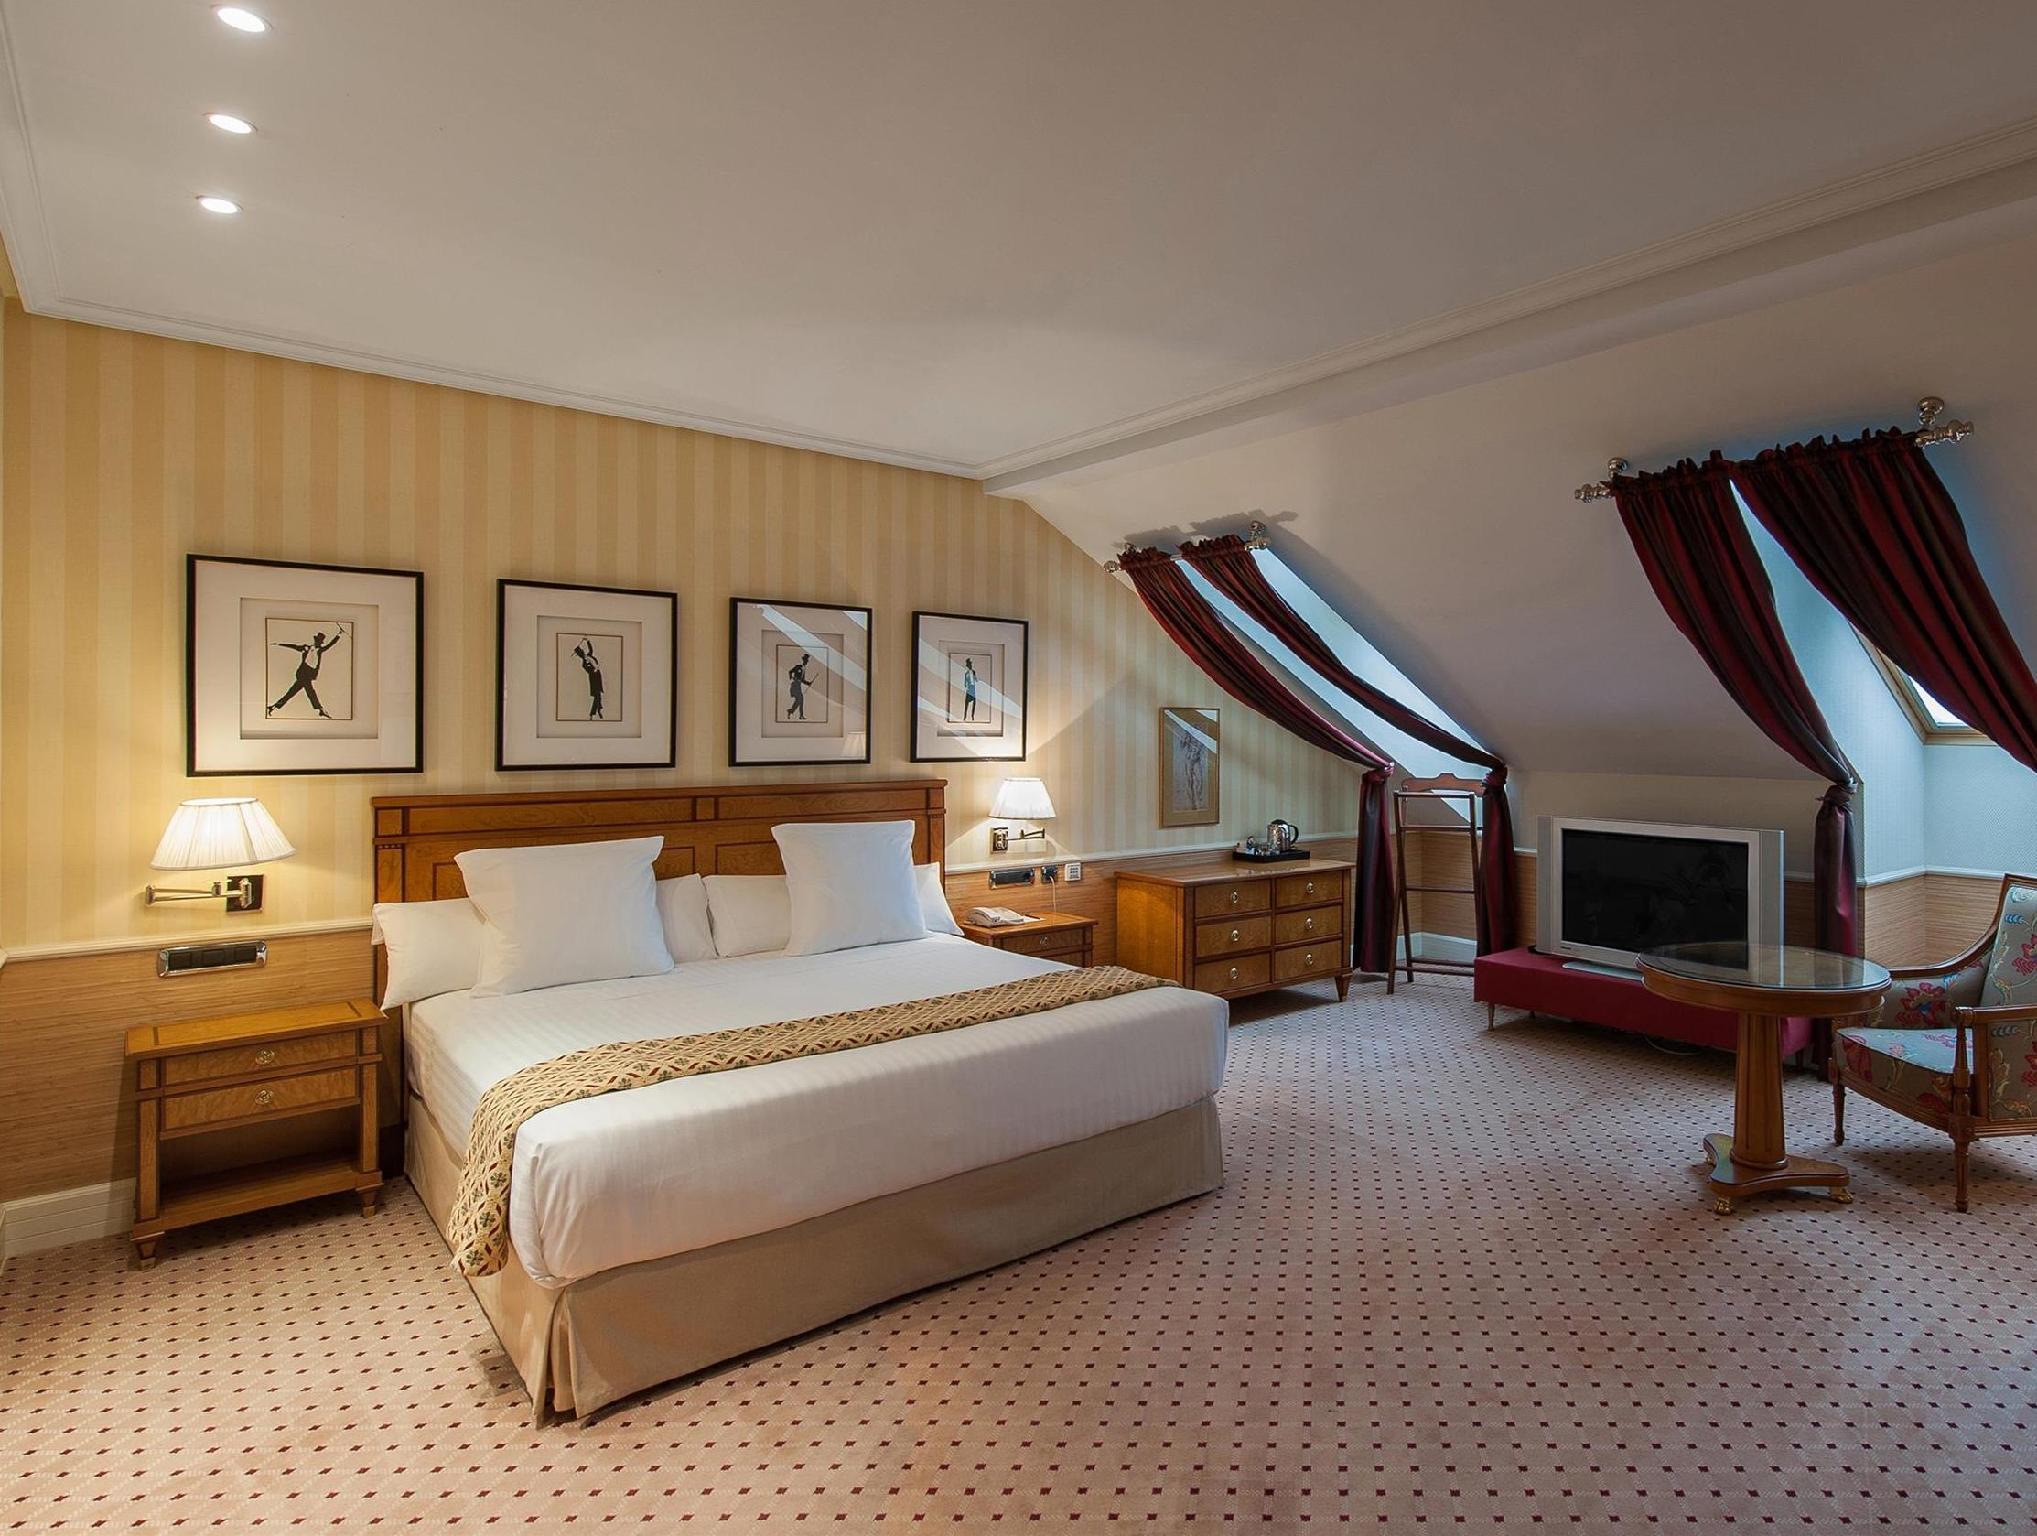 AC Hotel by Marriott Recoletos - 25 Photos & 12 Reviews ...